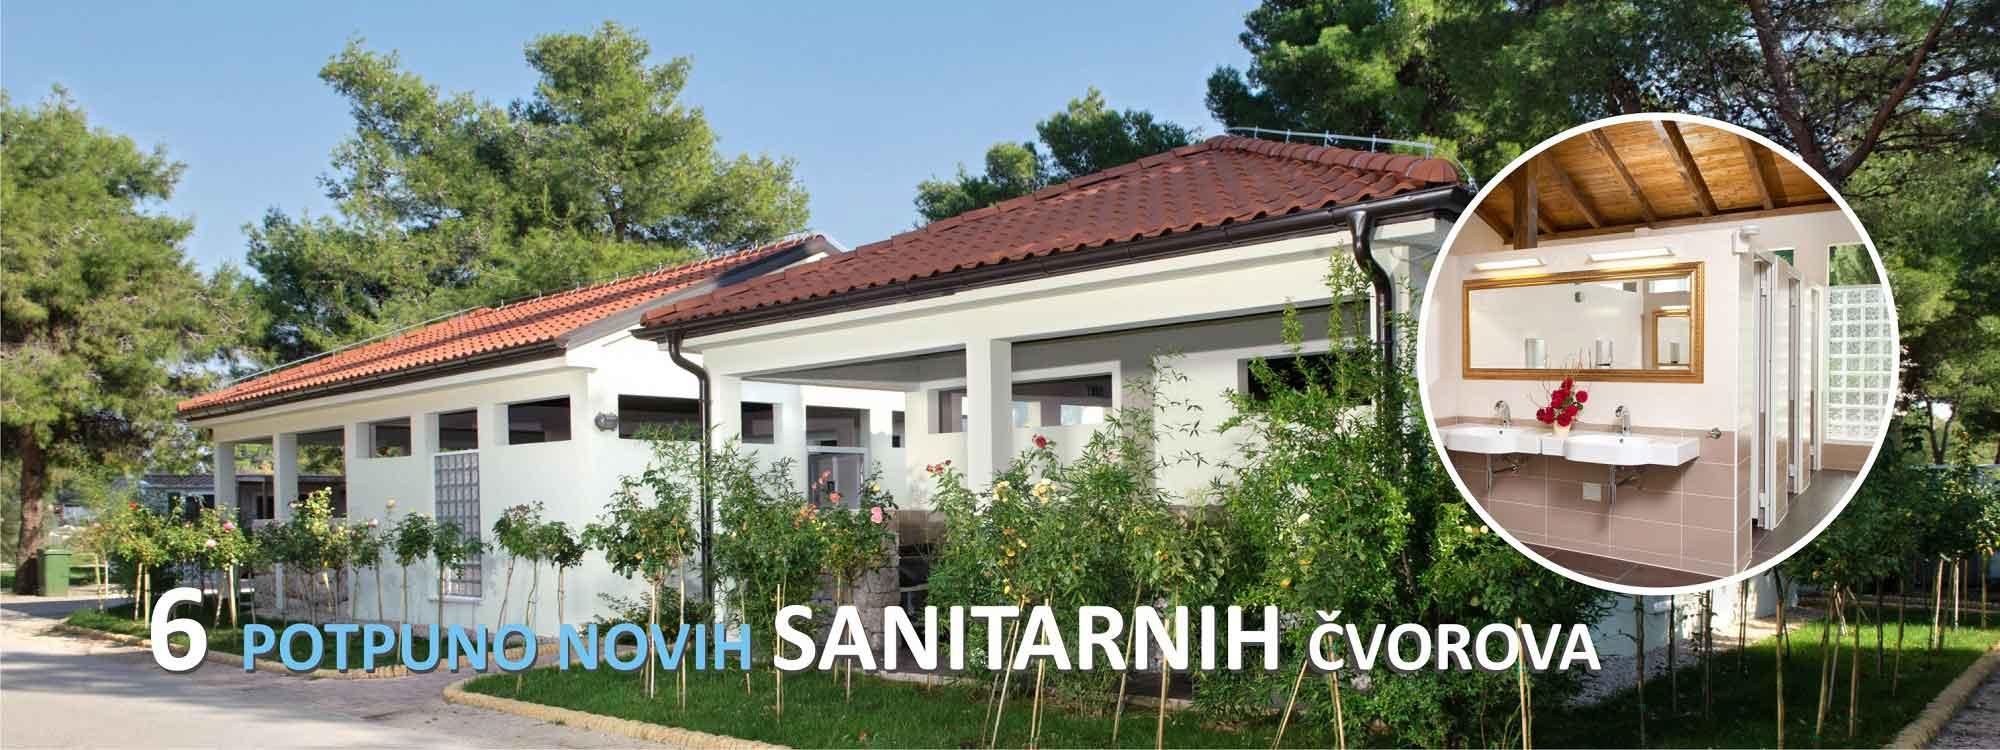 Solaris_camping_beach_resort_potpuno_novi_sanitarni_cvorovi_hrvatska_ponuda